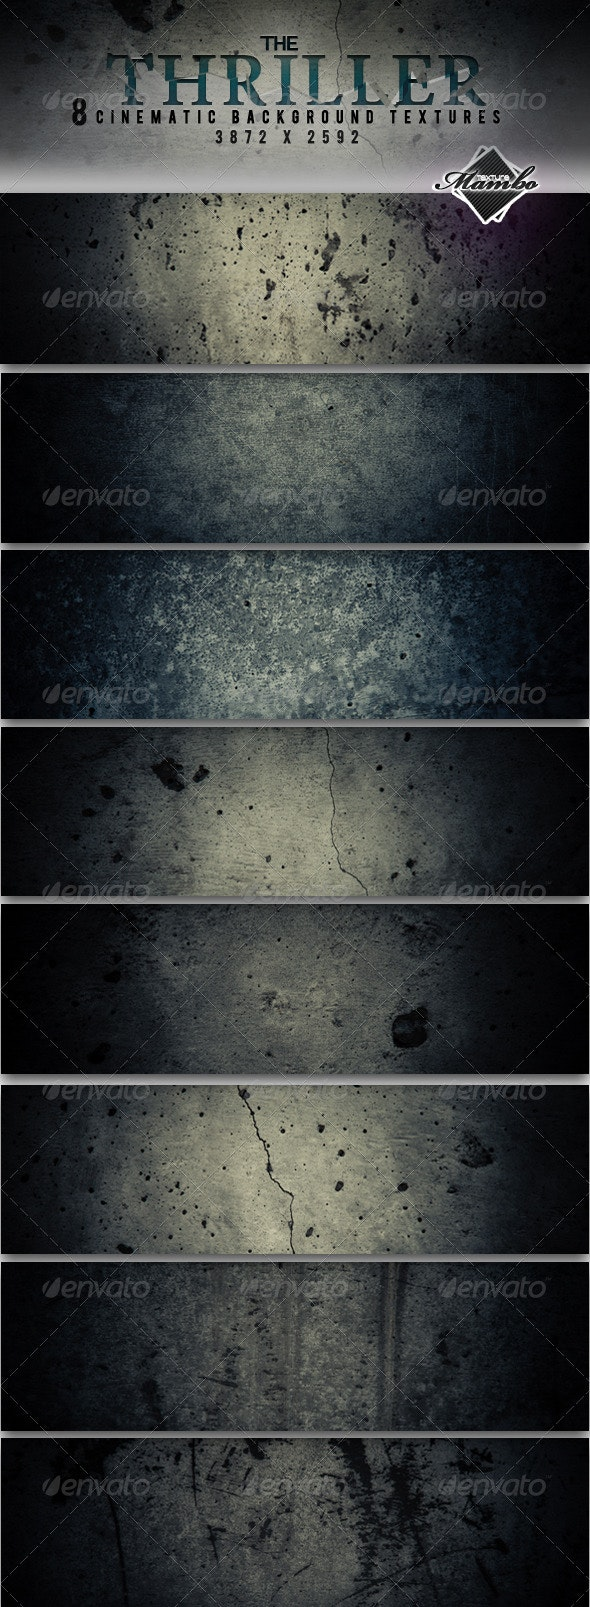 The thriller - cinematic background textures - Industrial / Grunge Textures